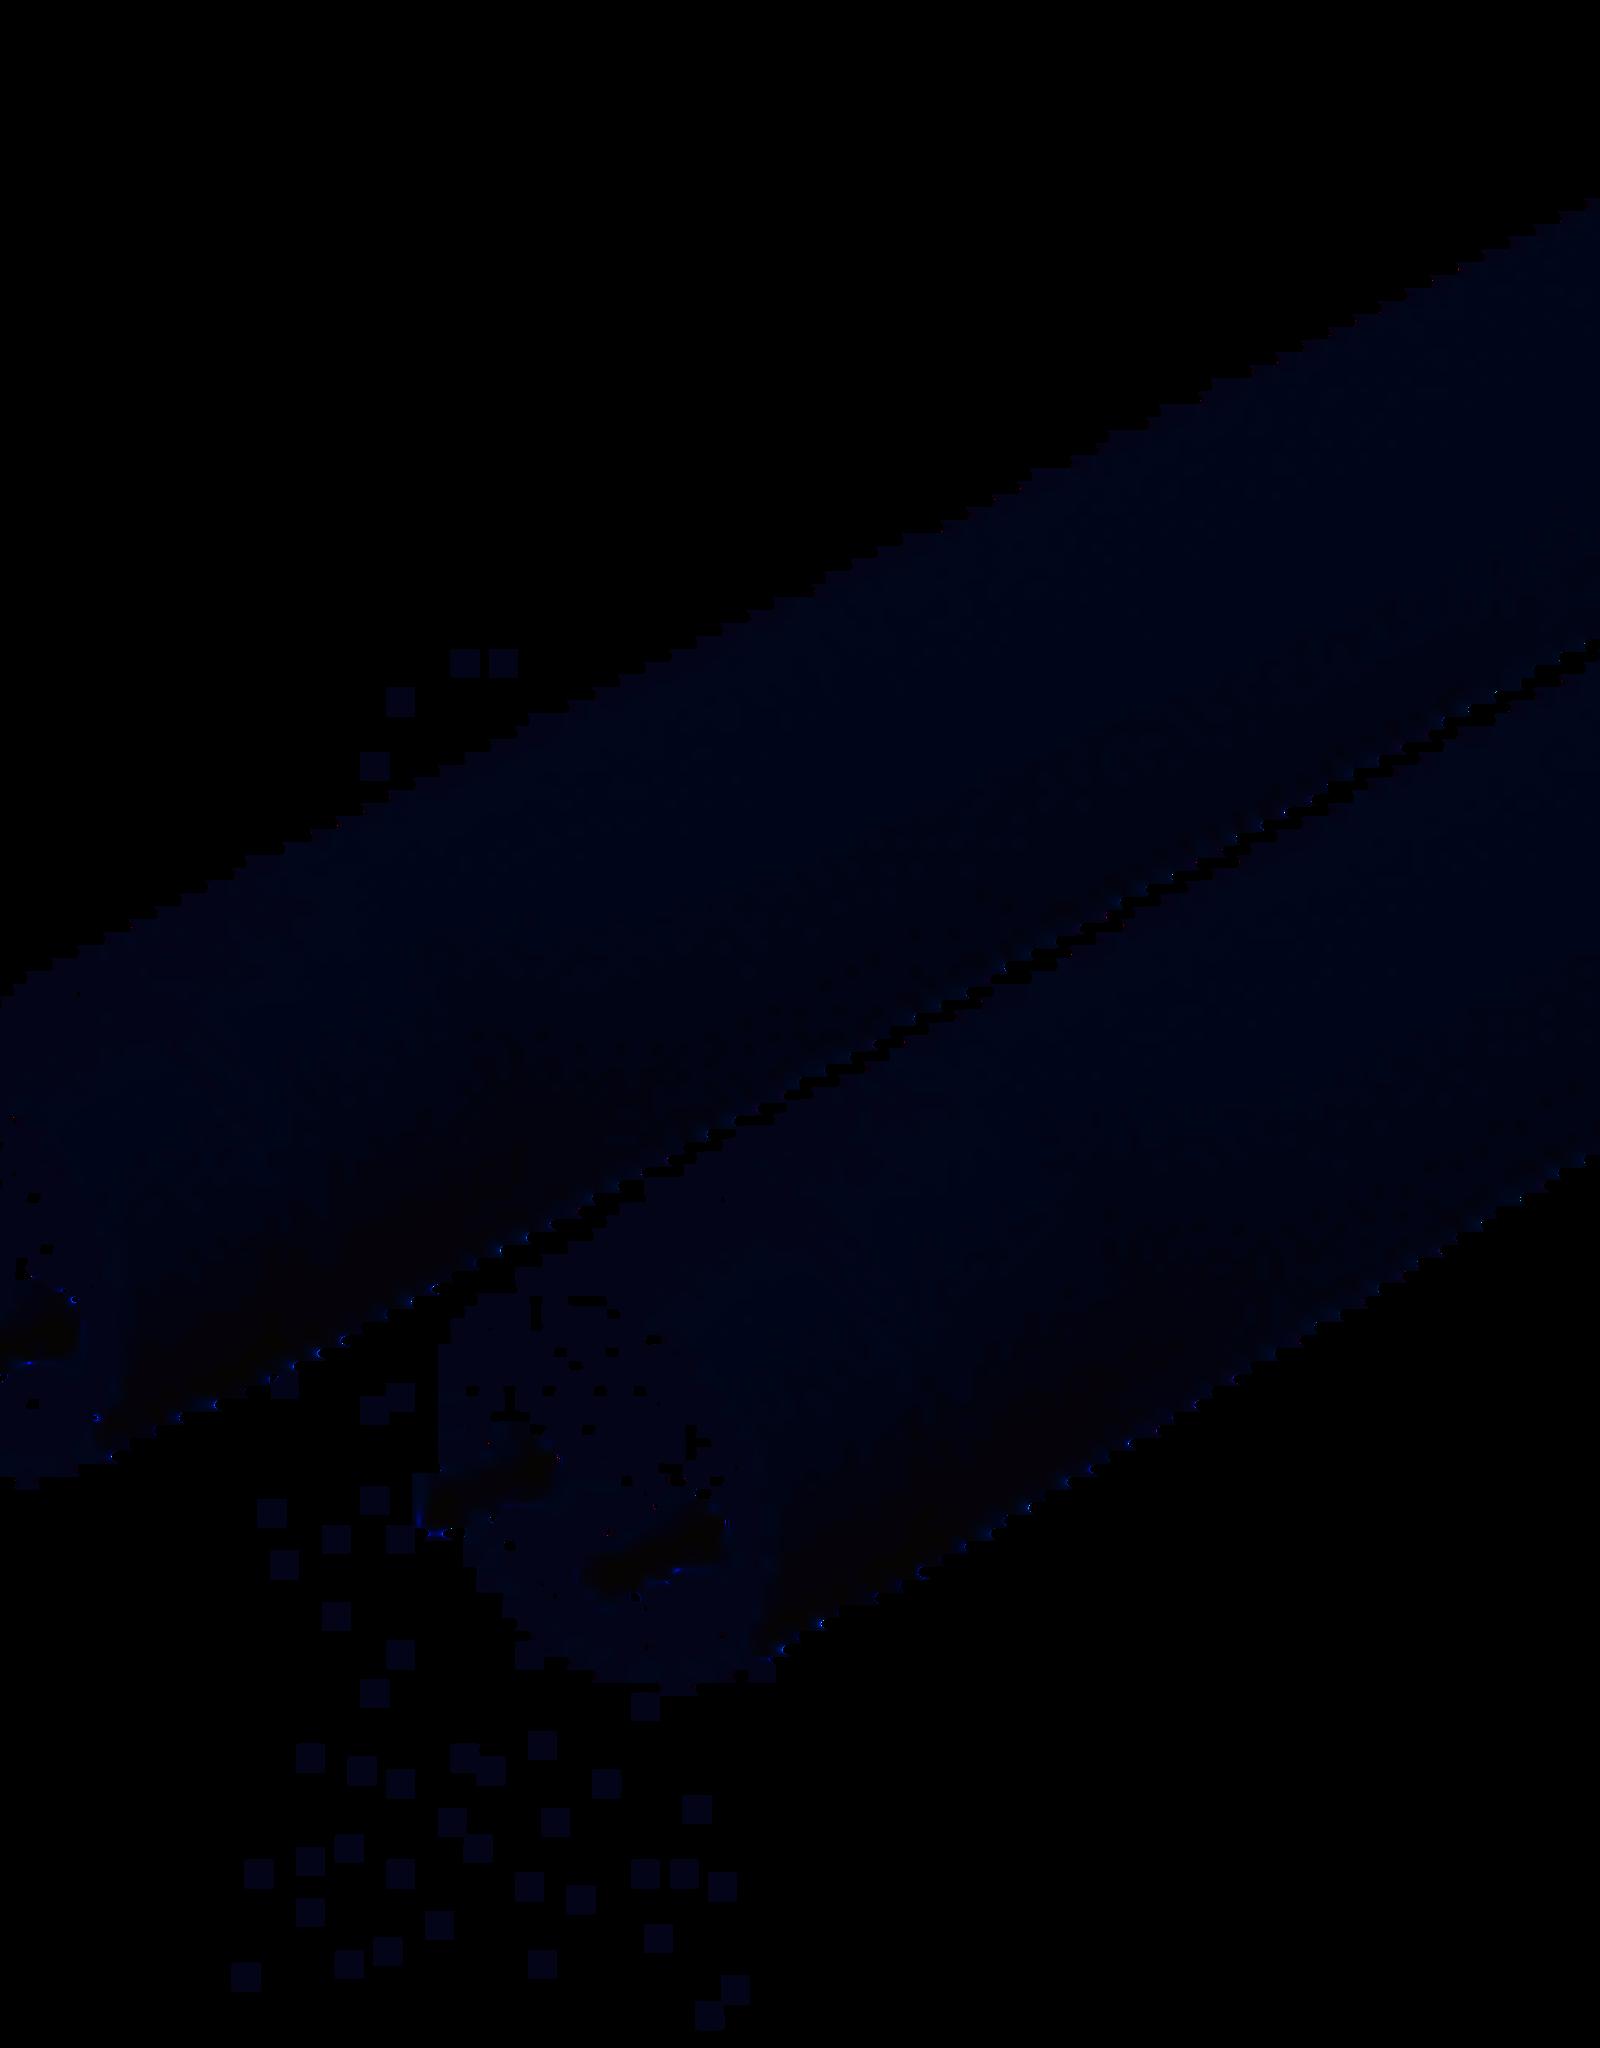 FEIT ELECTRIC COMPANY FEIT LED 4 FT TUBES 2 PK